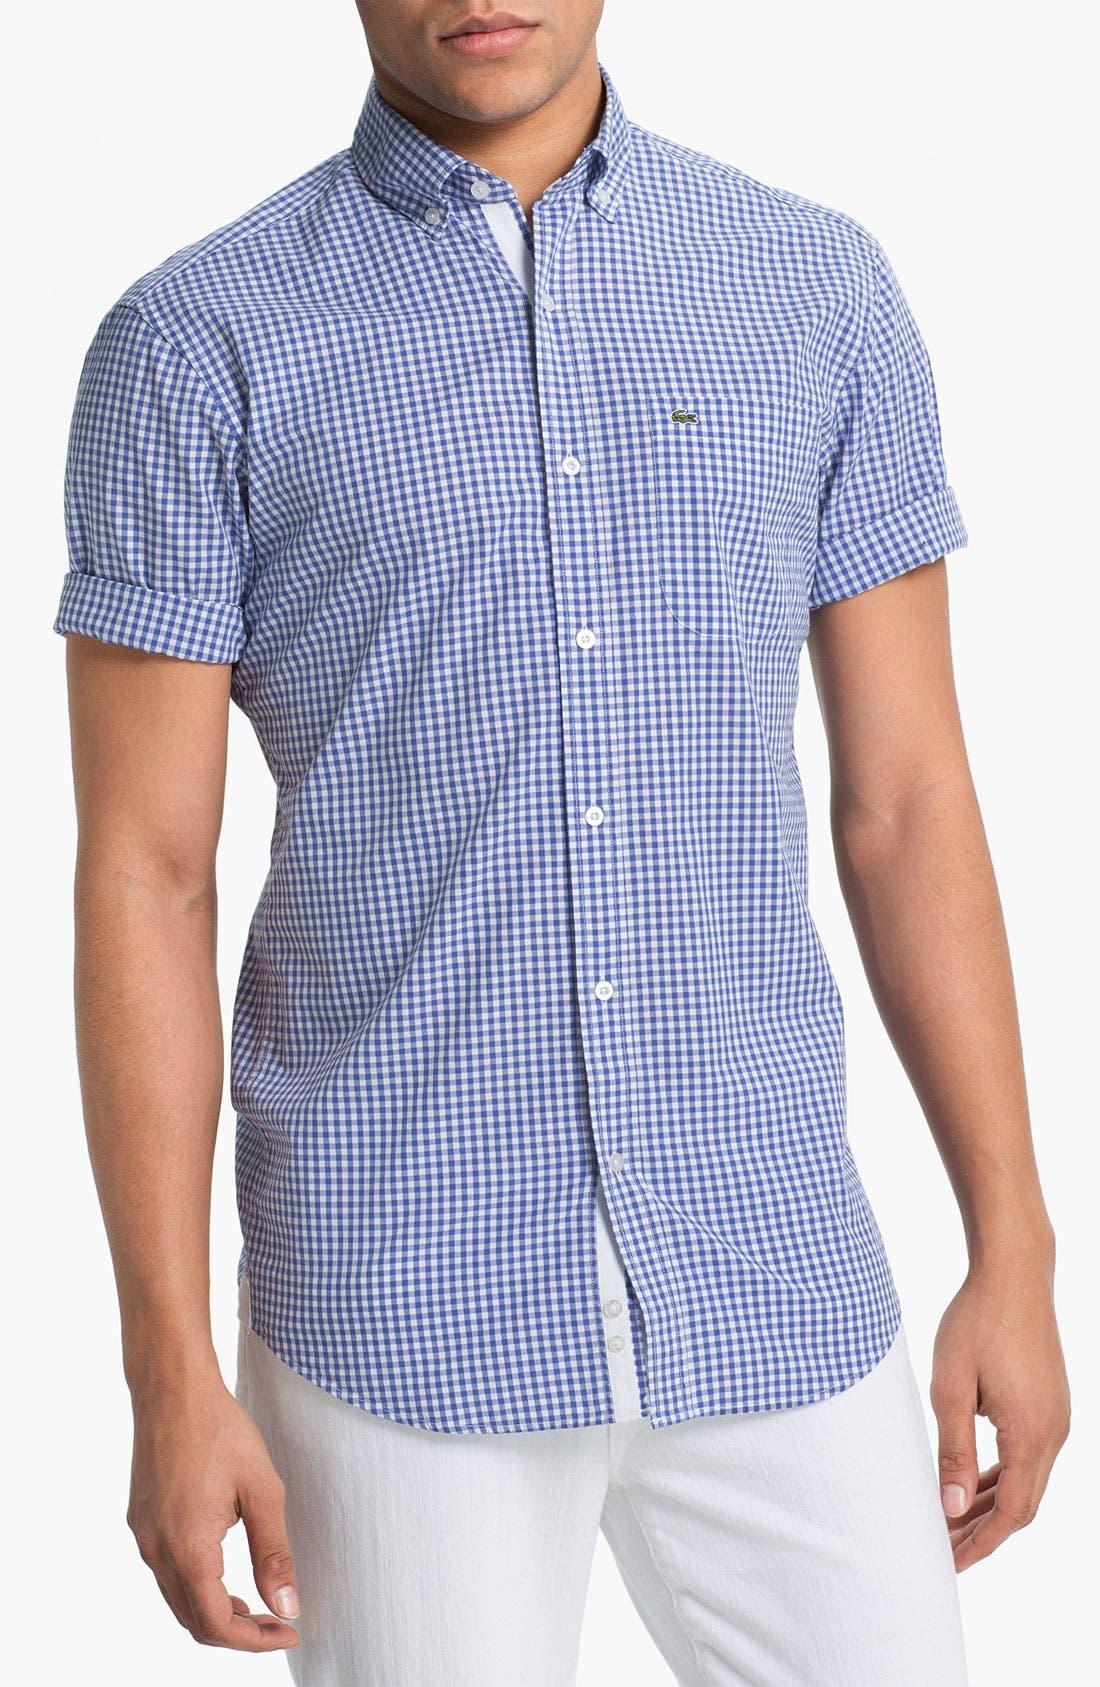 Main Image - Lacoste Short Sleeve Button Down Shirt (Big)